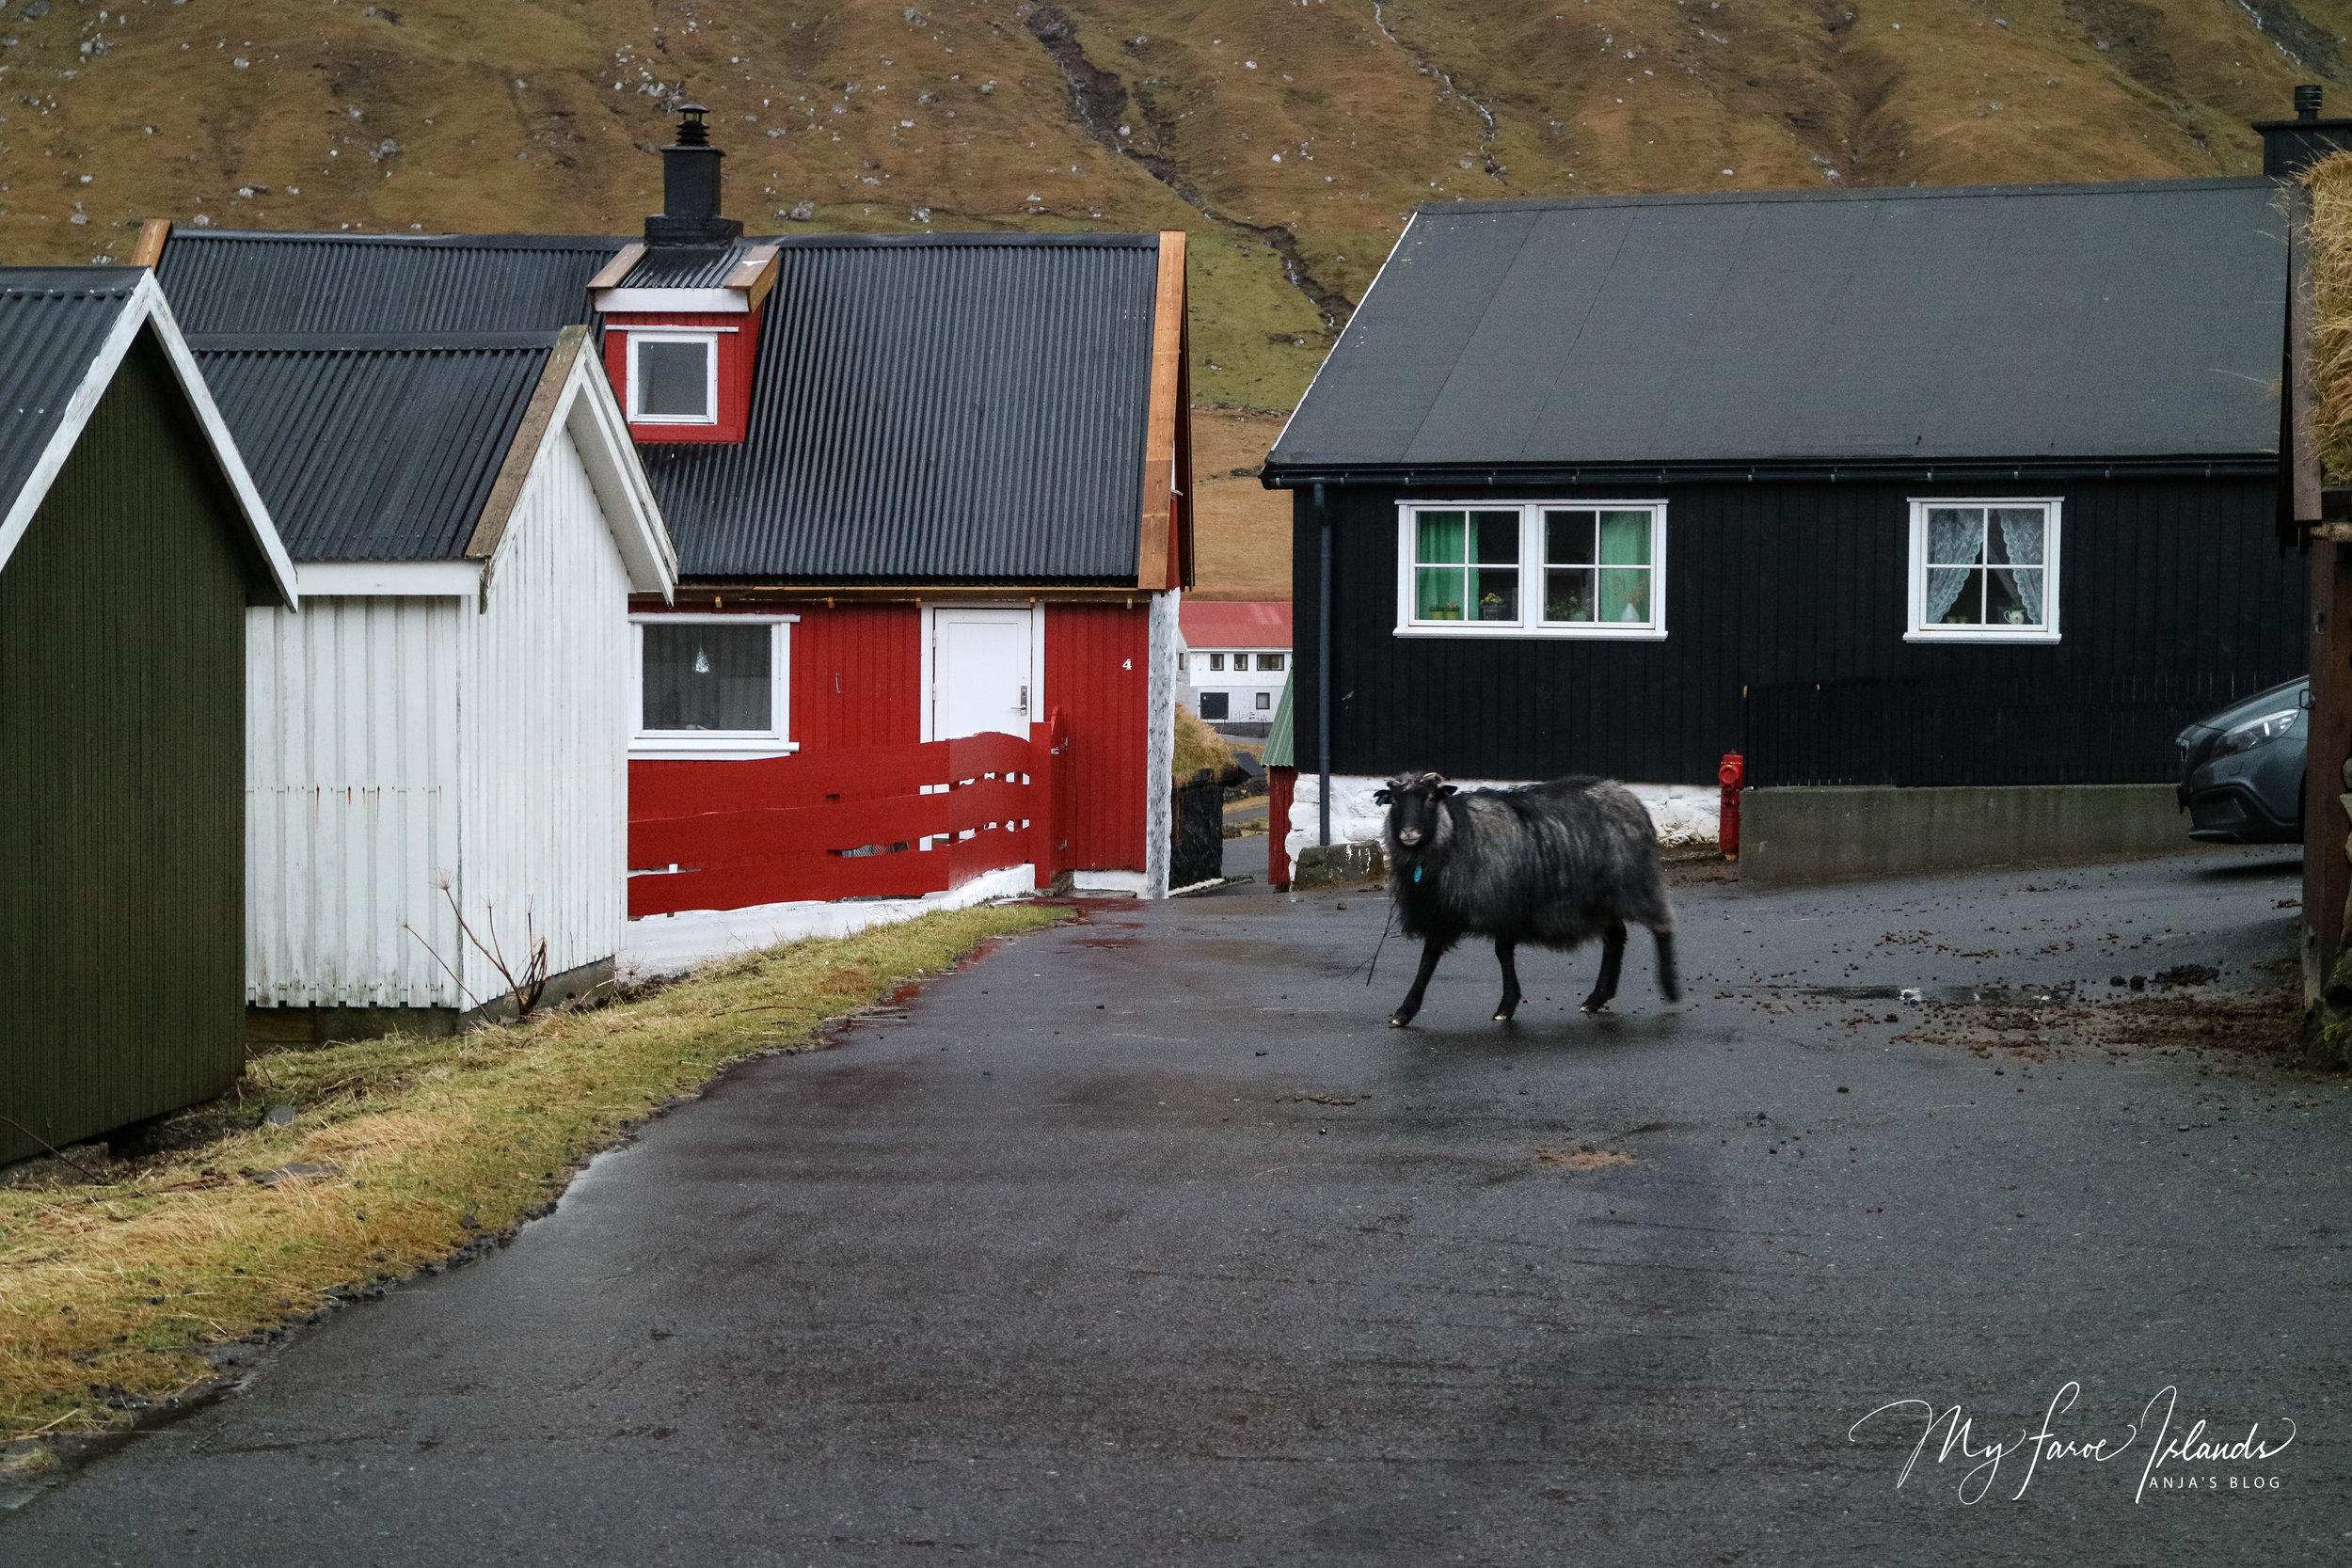 Sheep Near Car © My Faroe Islands, Anja Mazuhn  (1 von 1).jpg